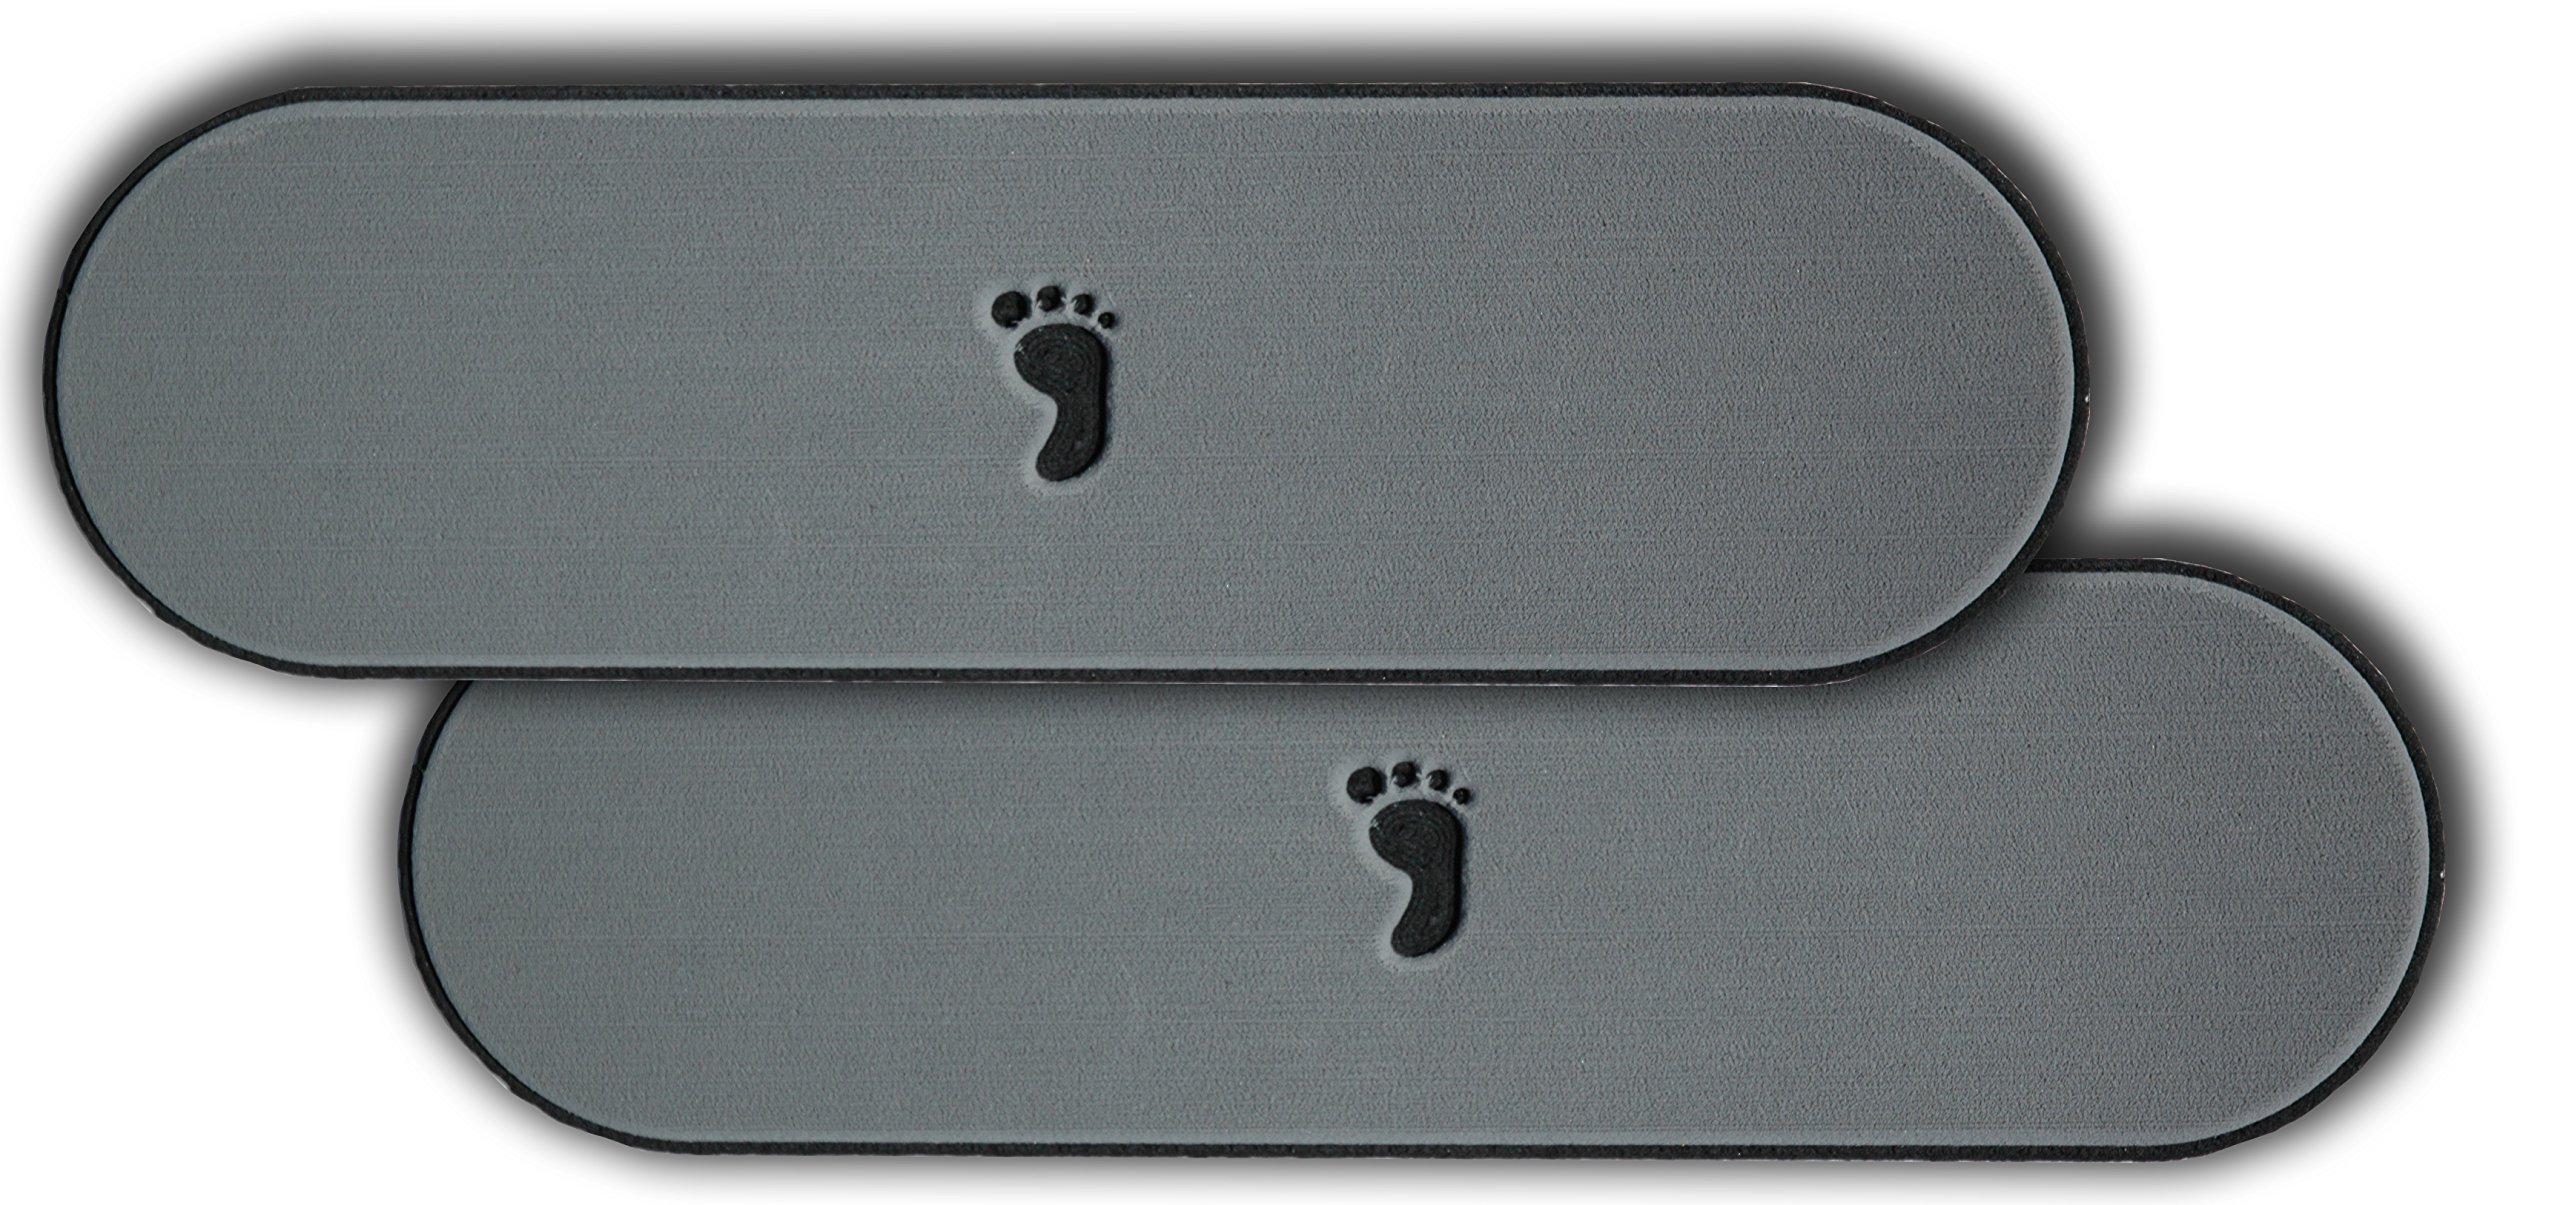 2-Pack of Evateak Anti-Slip Gunnel Pads 18''x 4'' - Gray